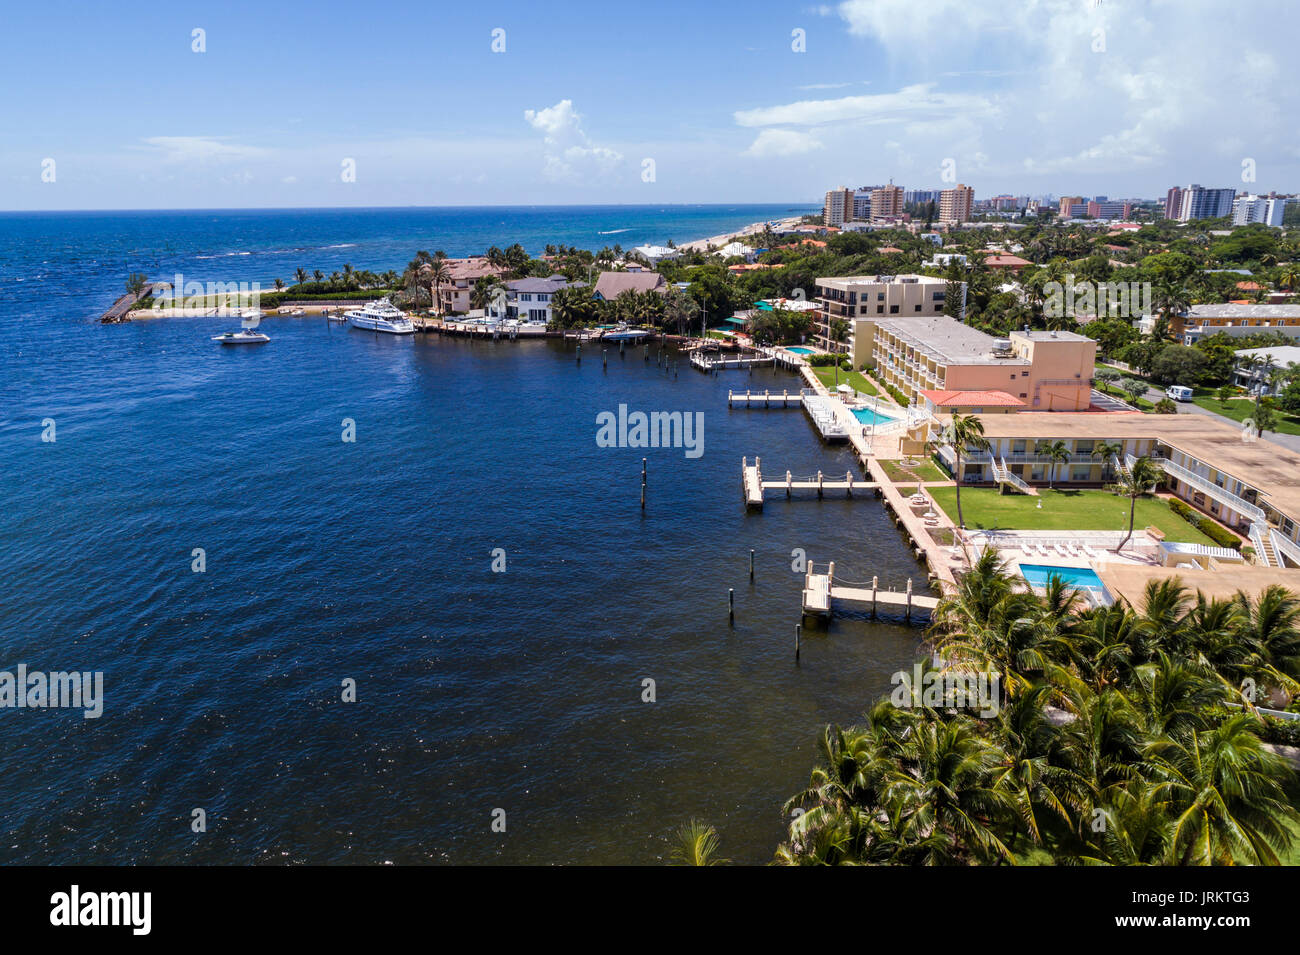 Hotels Motels In Pompano Beach Florida